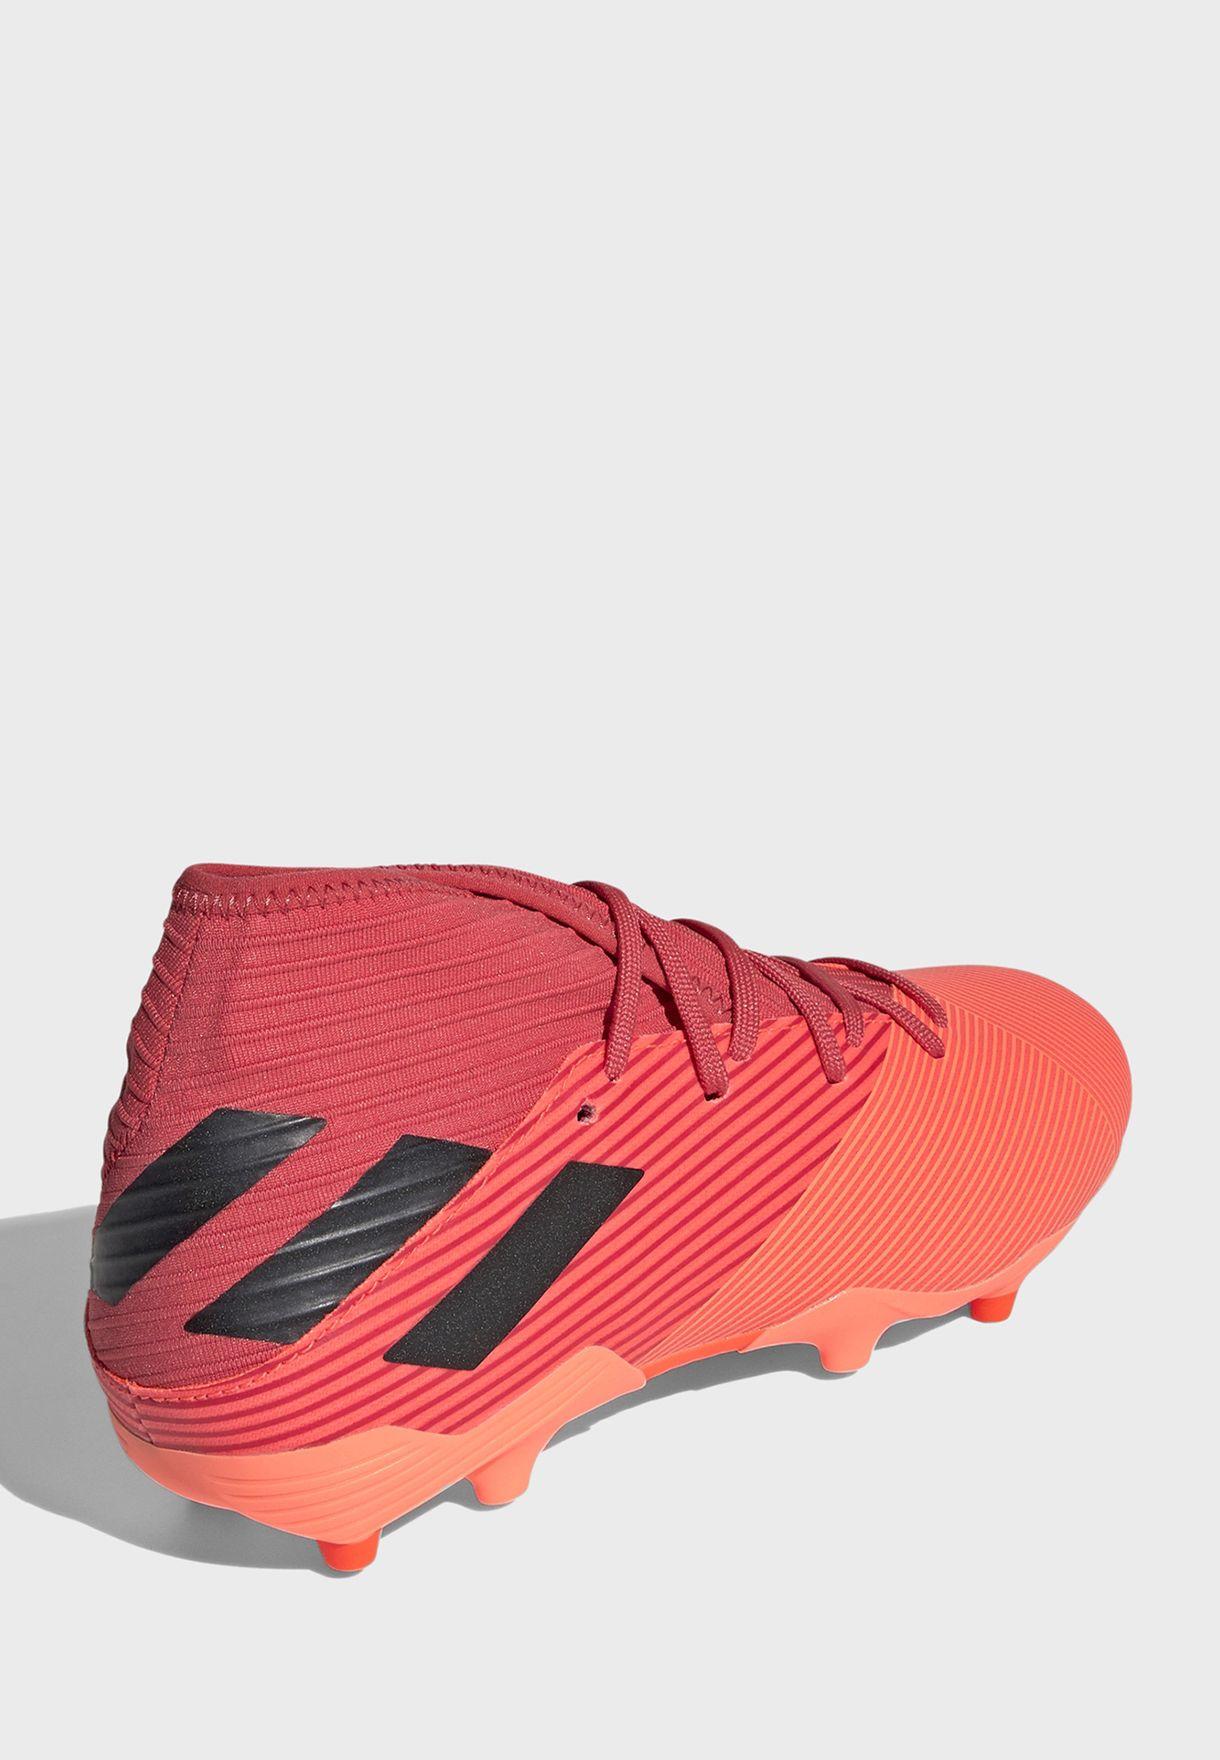 حذاء نيميزز 19.3 اف جي